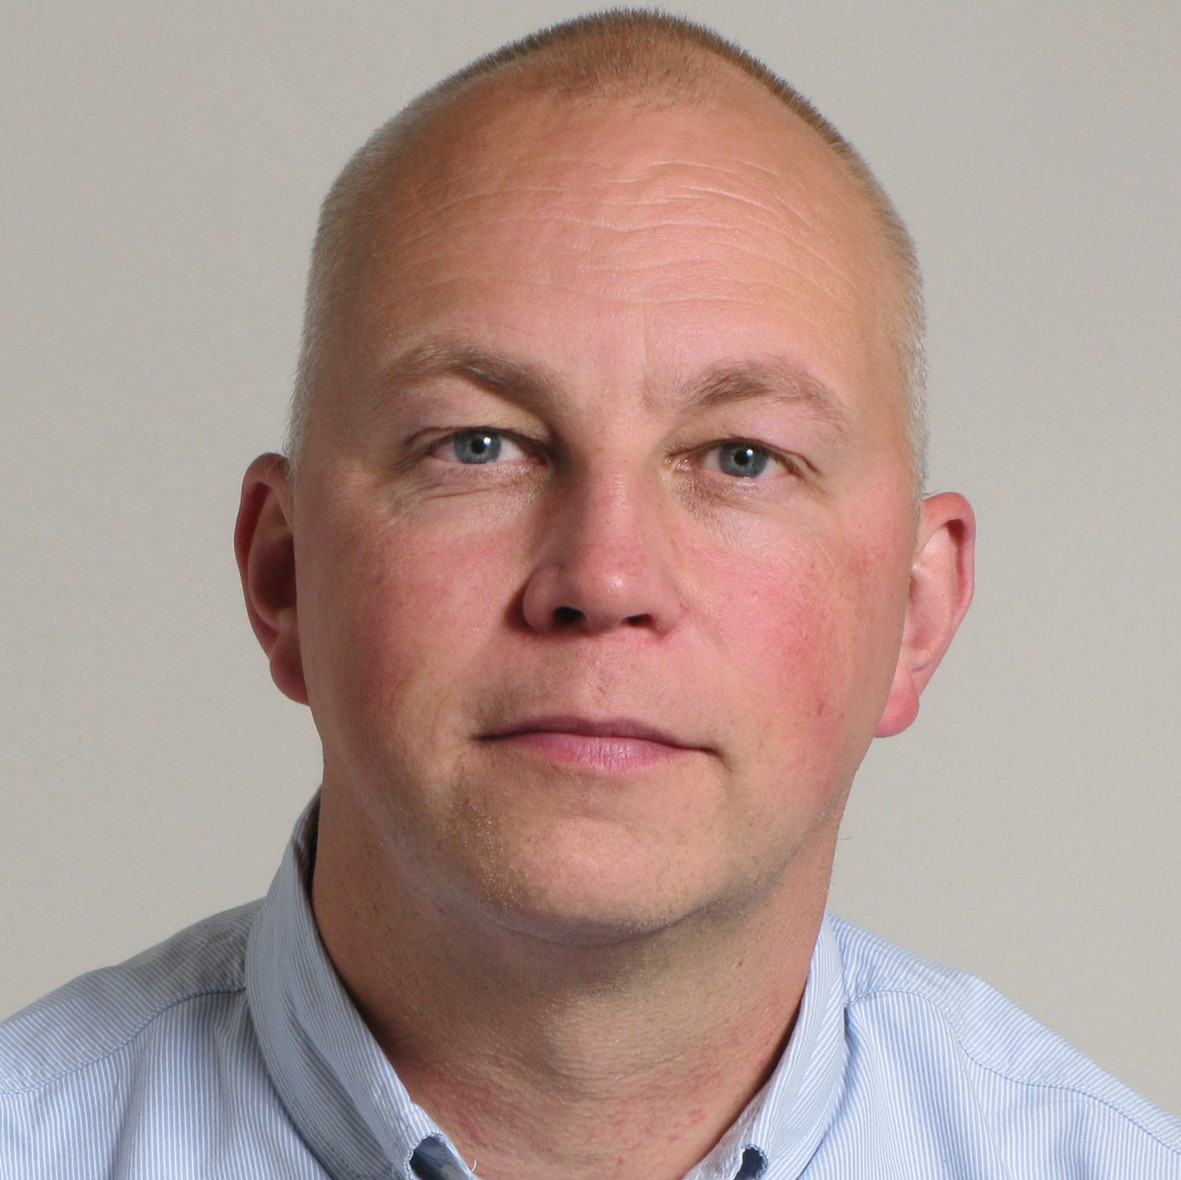 Jörgen Boman